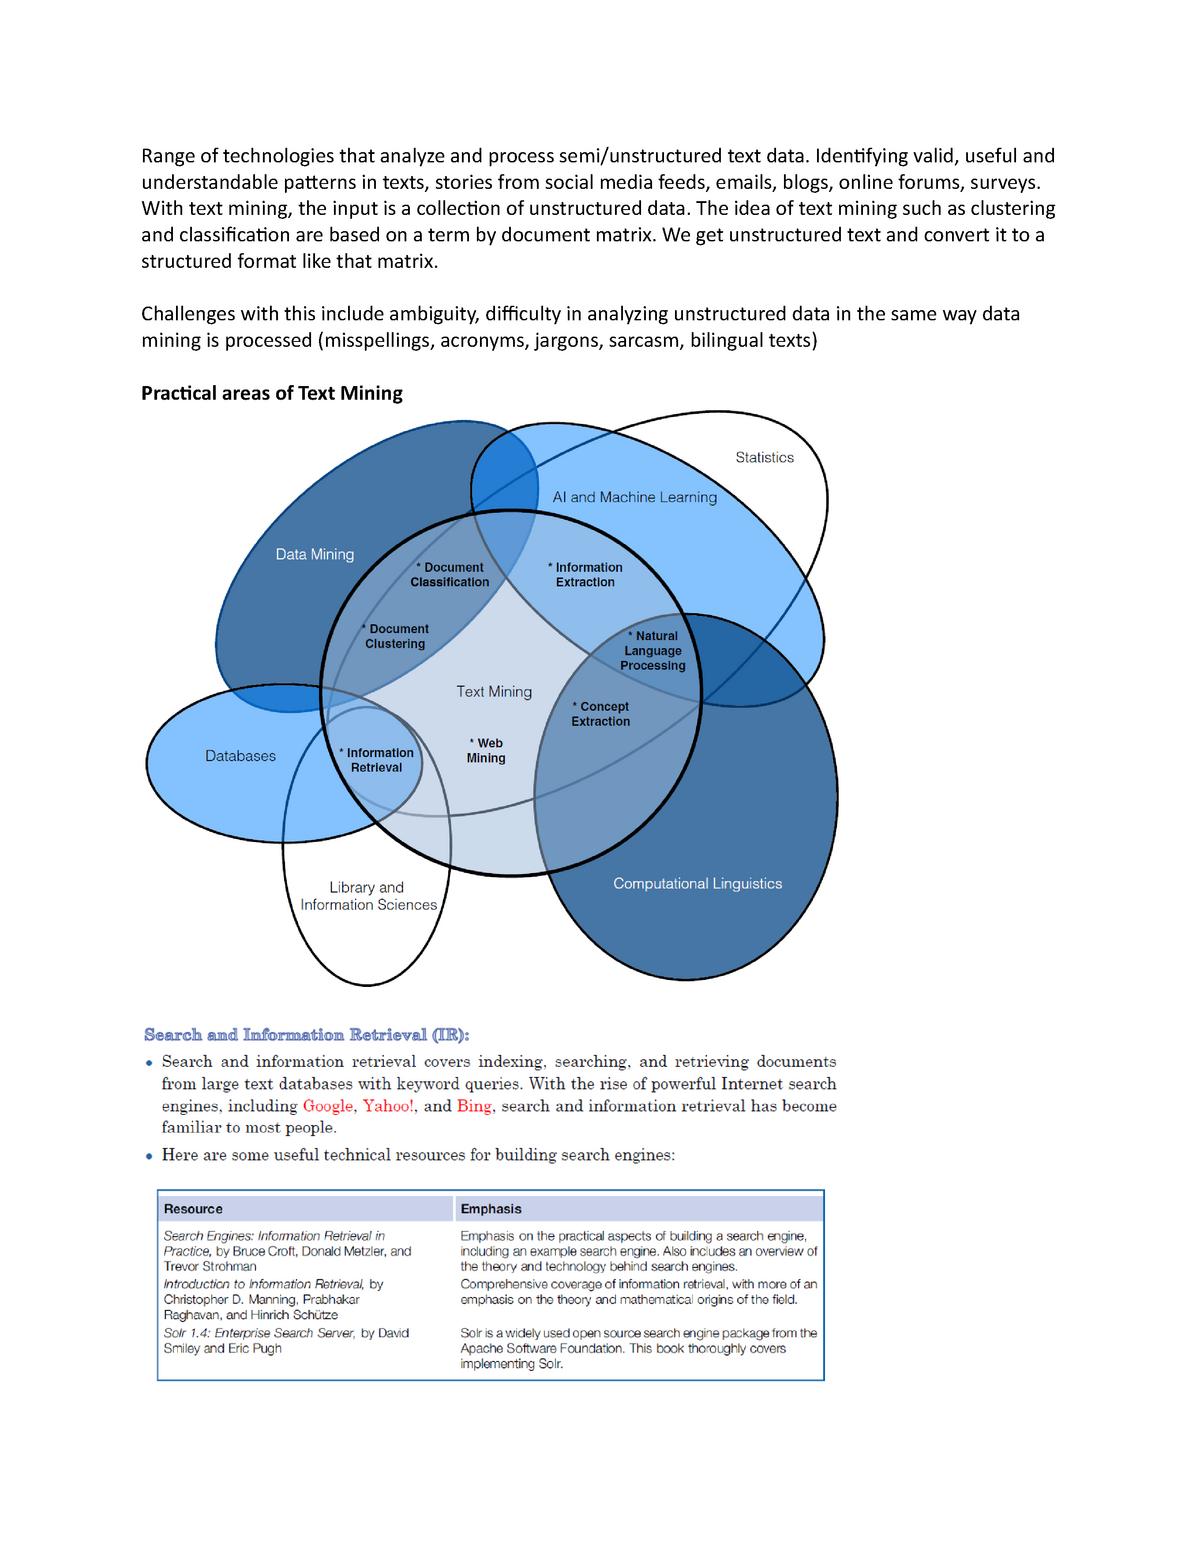 Text Mining & Sentimental Analysis - ITM 618 - Ryerson - StuDocu